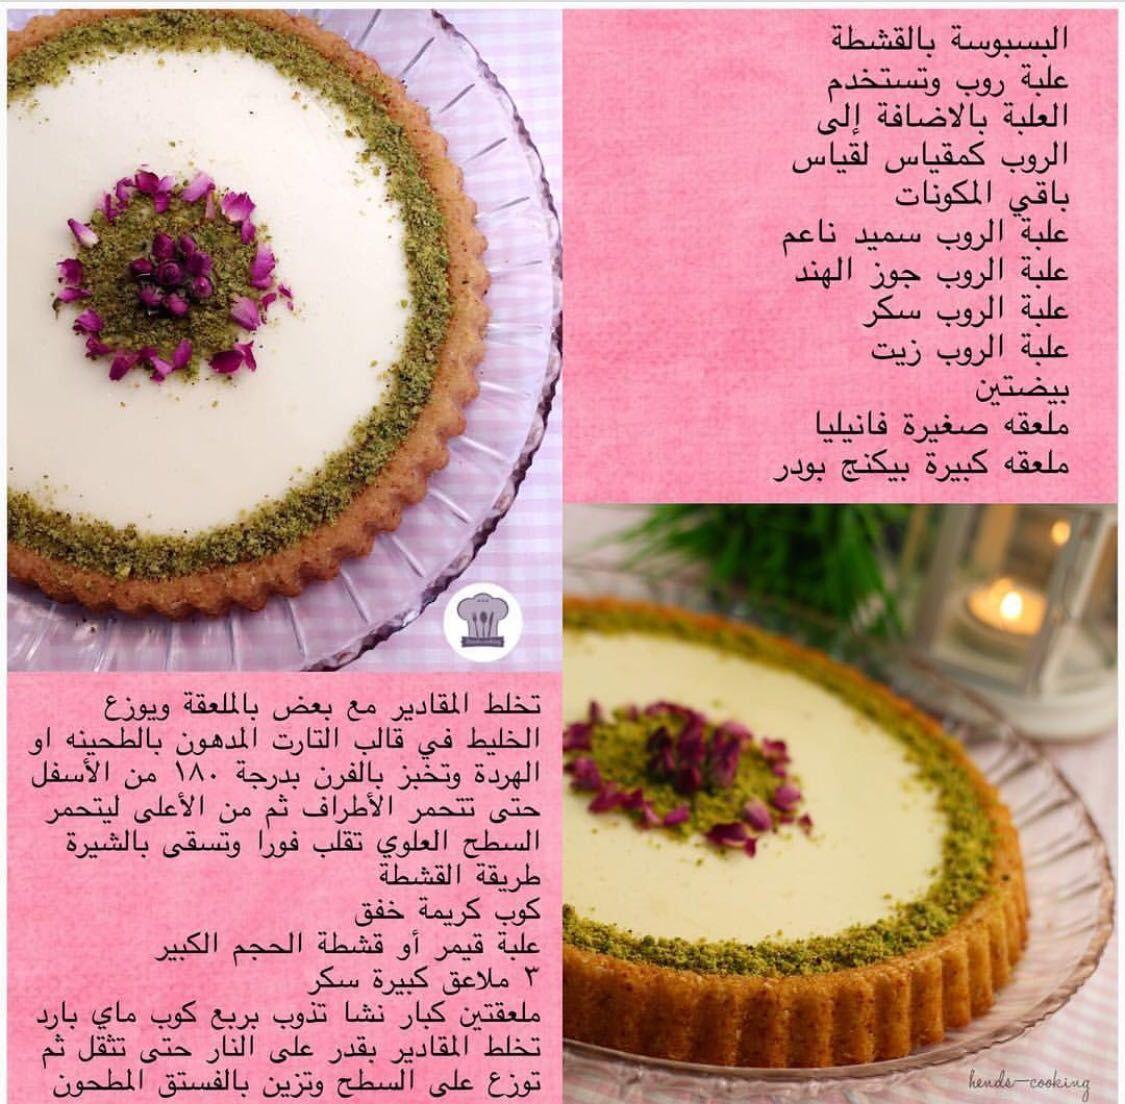 Pin By Hiba On كيك Sweets Recipes Yummy Food Dessert Arabic Food